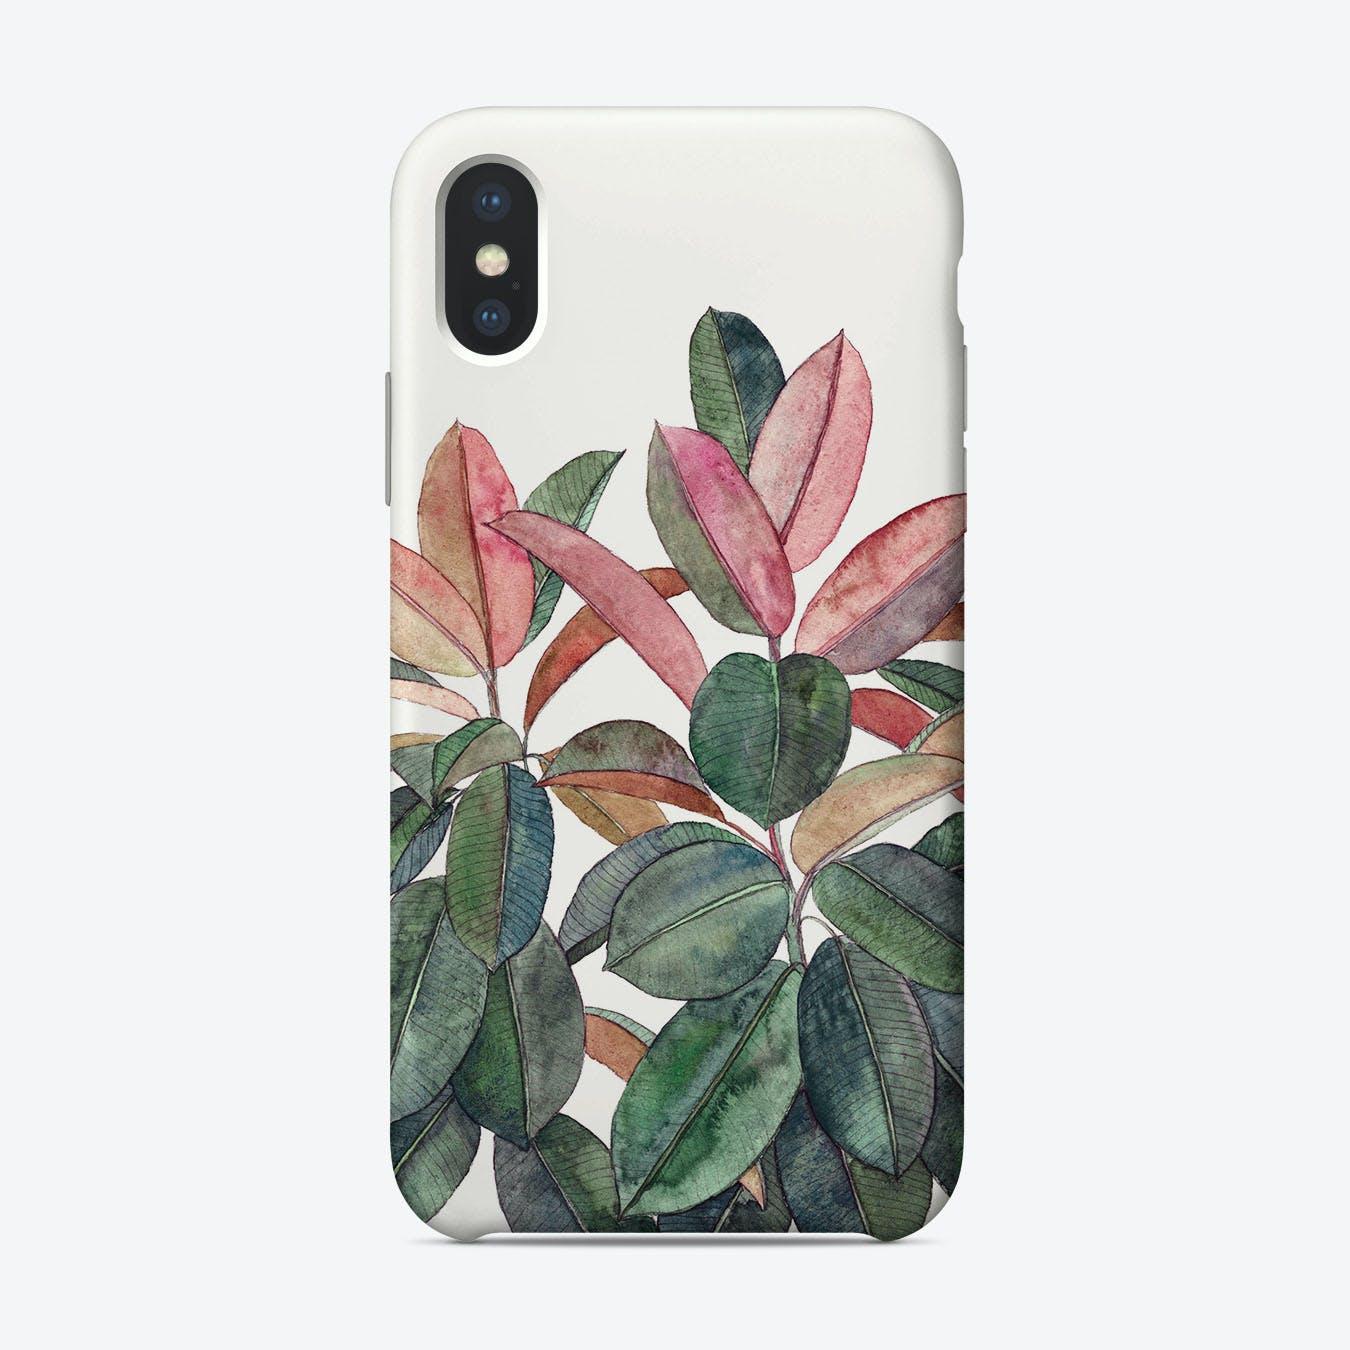 Rubber Plant  iPhone Case